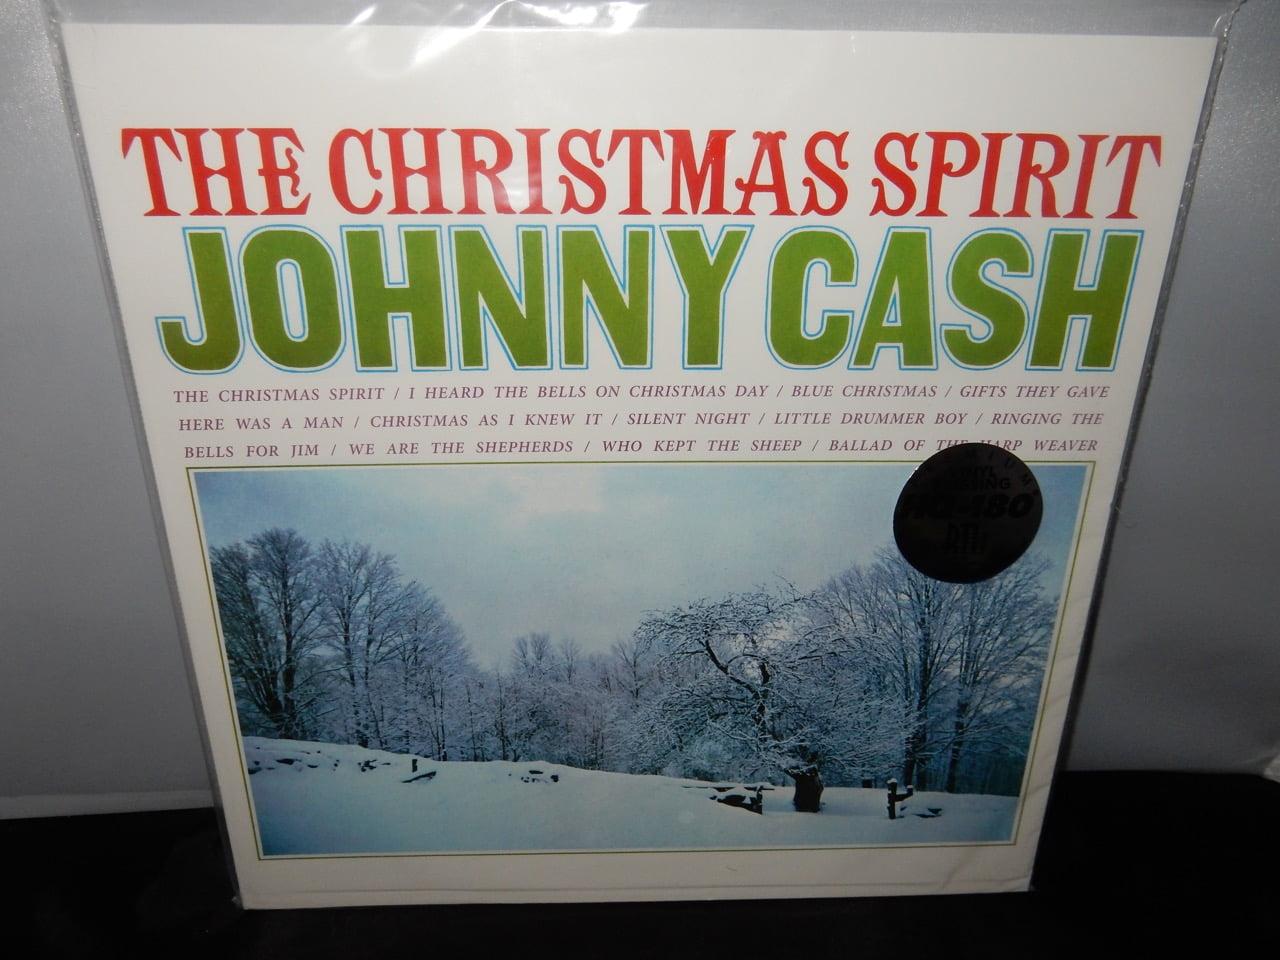 Johnny Cash I Heard The Bells On Christmas Day.Johnny Cash The Christmas Spirit Ltd Ed Red Colored 180g Vinyl New